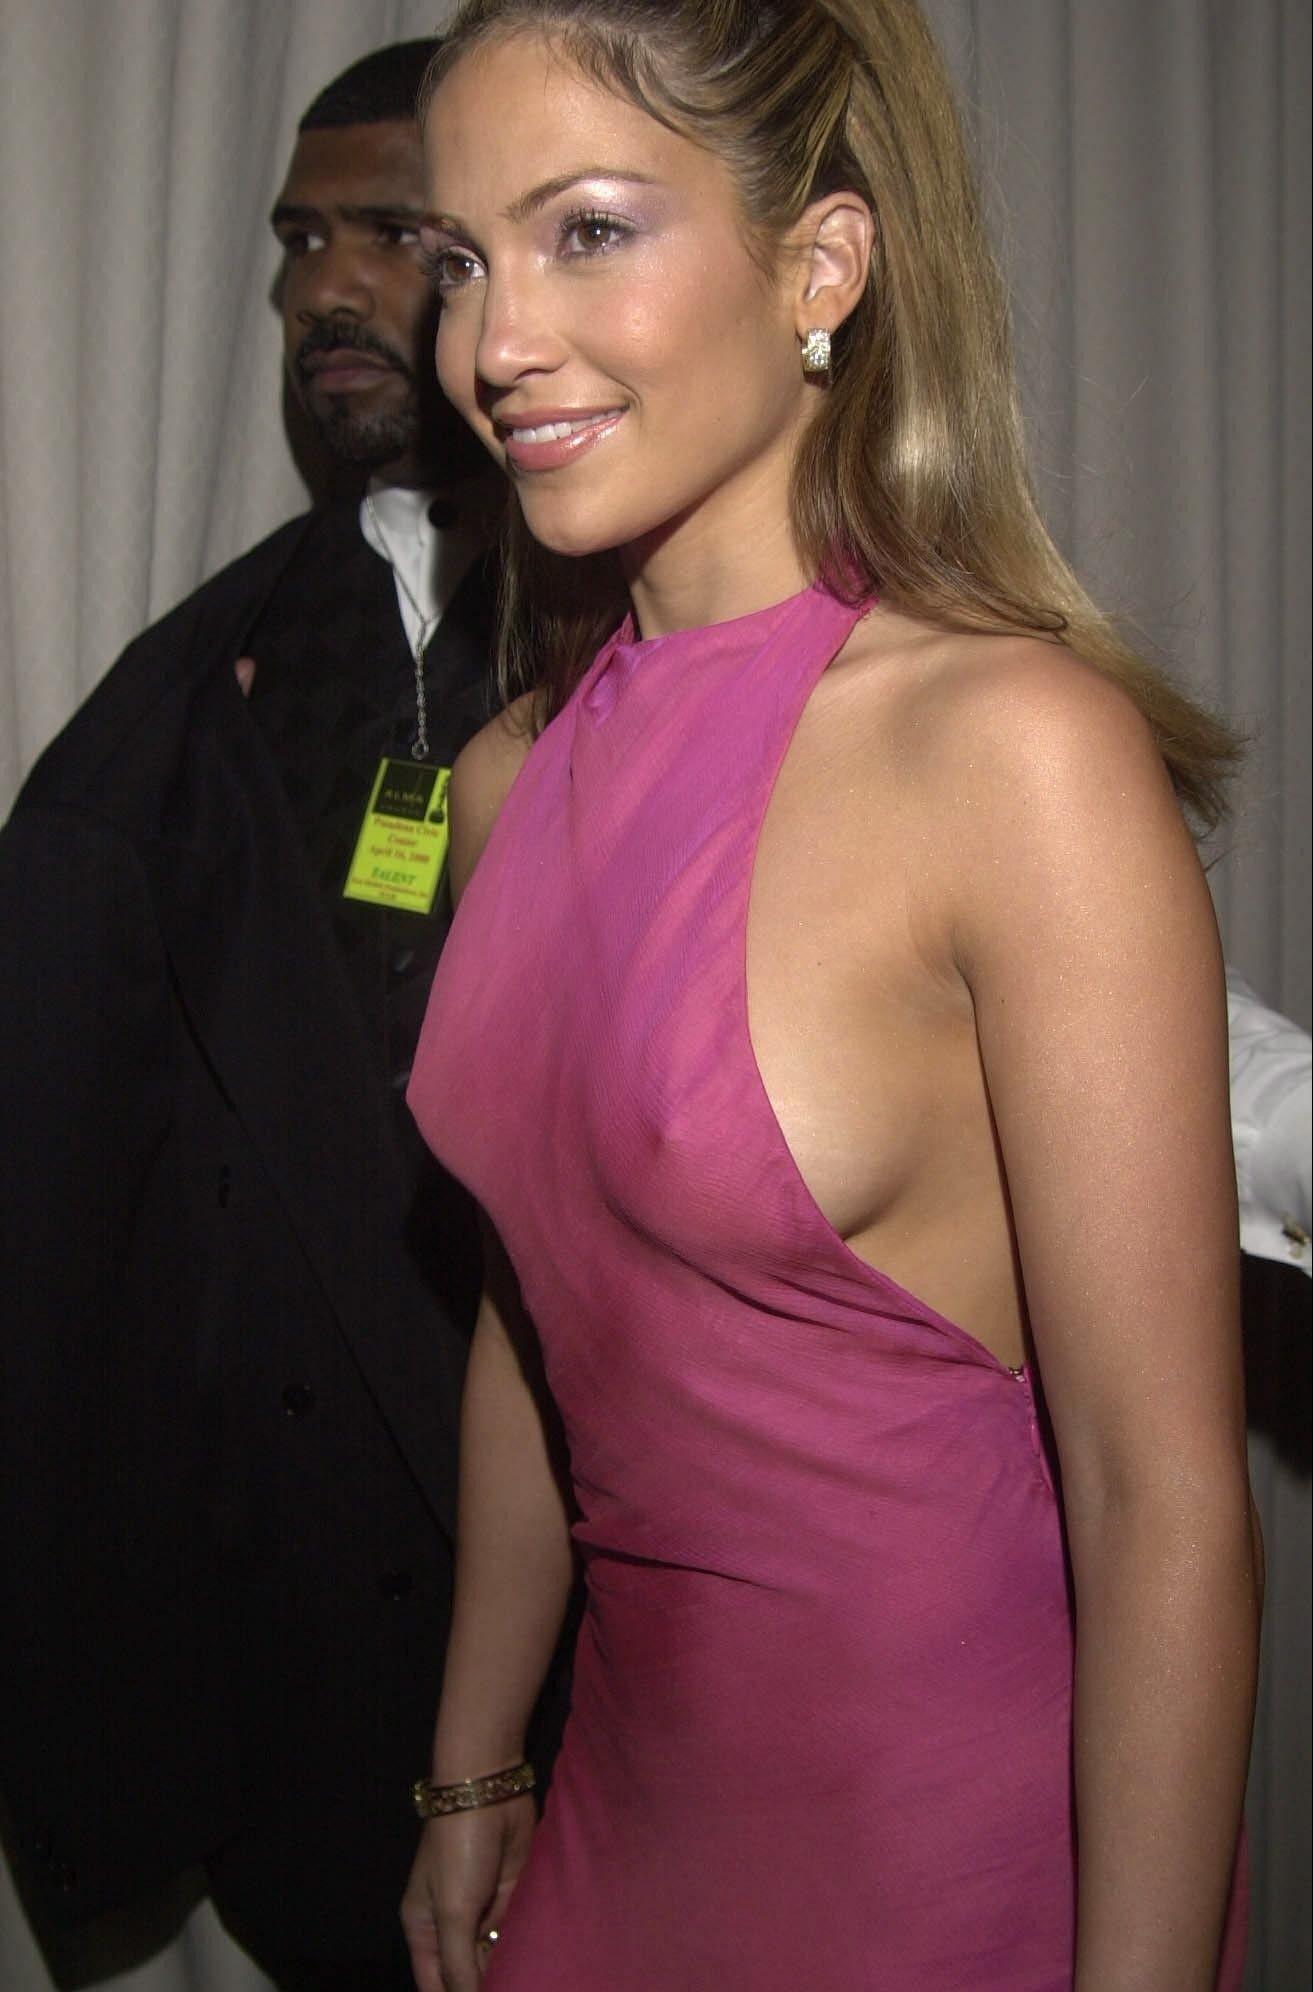 Jennifer lopez boobs nude (98 photos), Fappening Celebrity photos